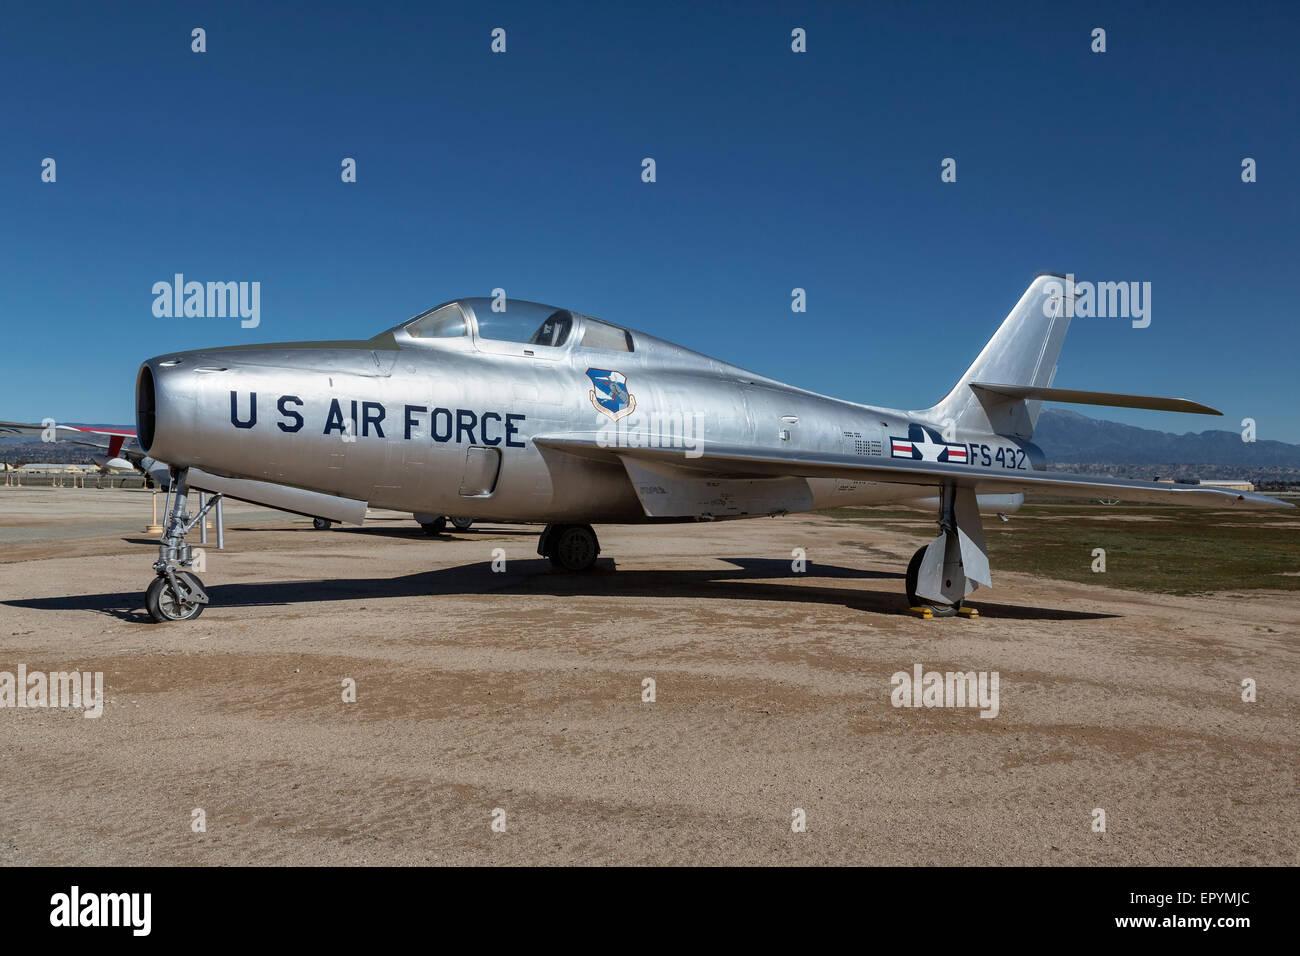 Republic F84 Thunderstreak of the USAF - Stock Image